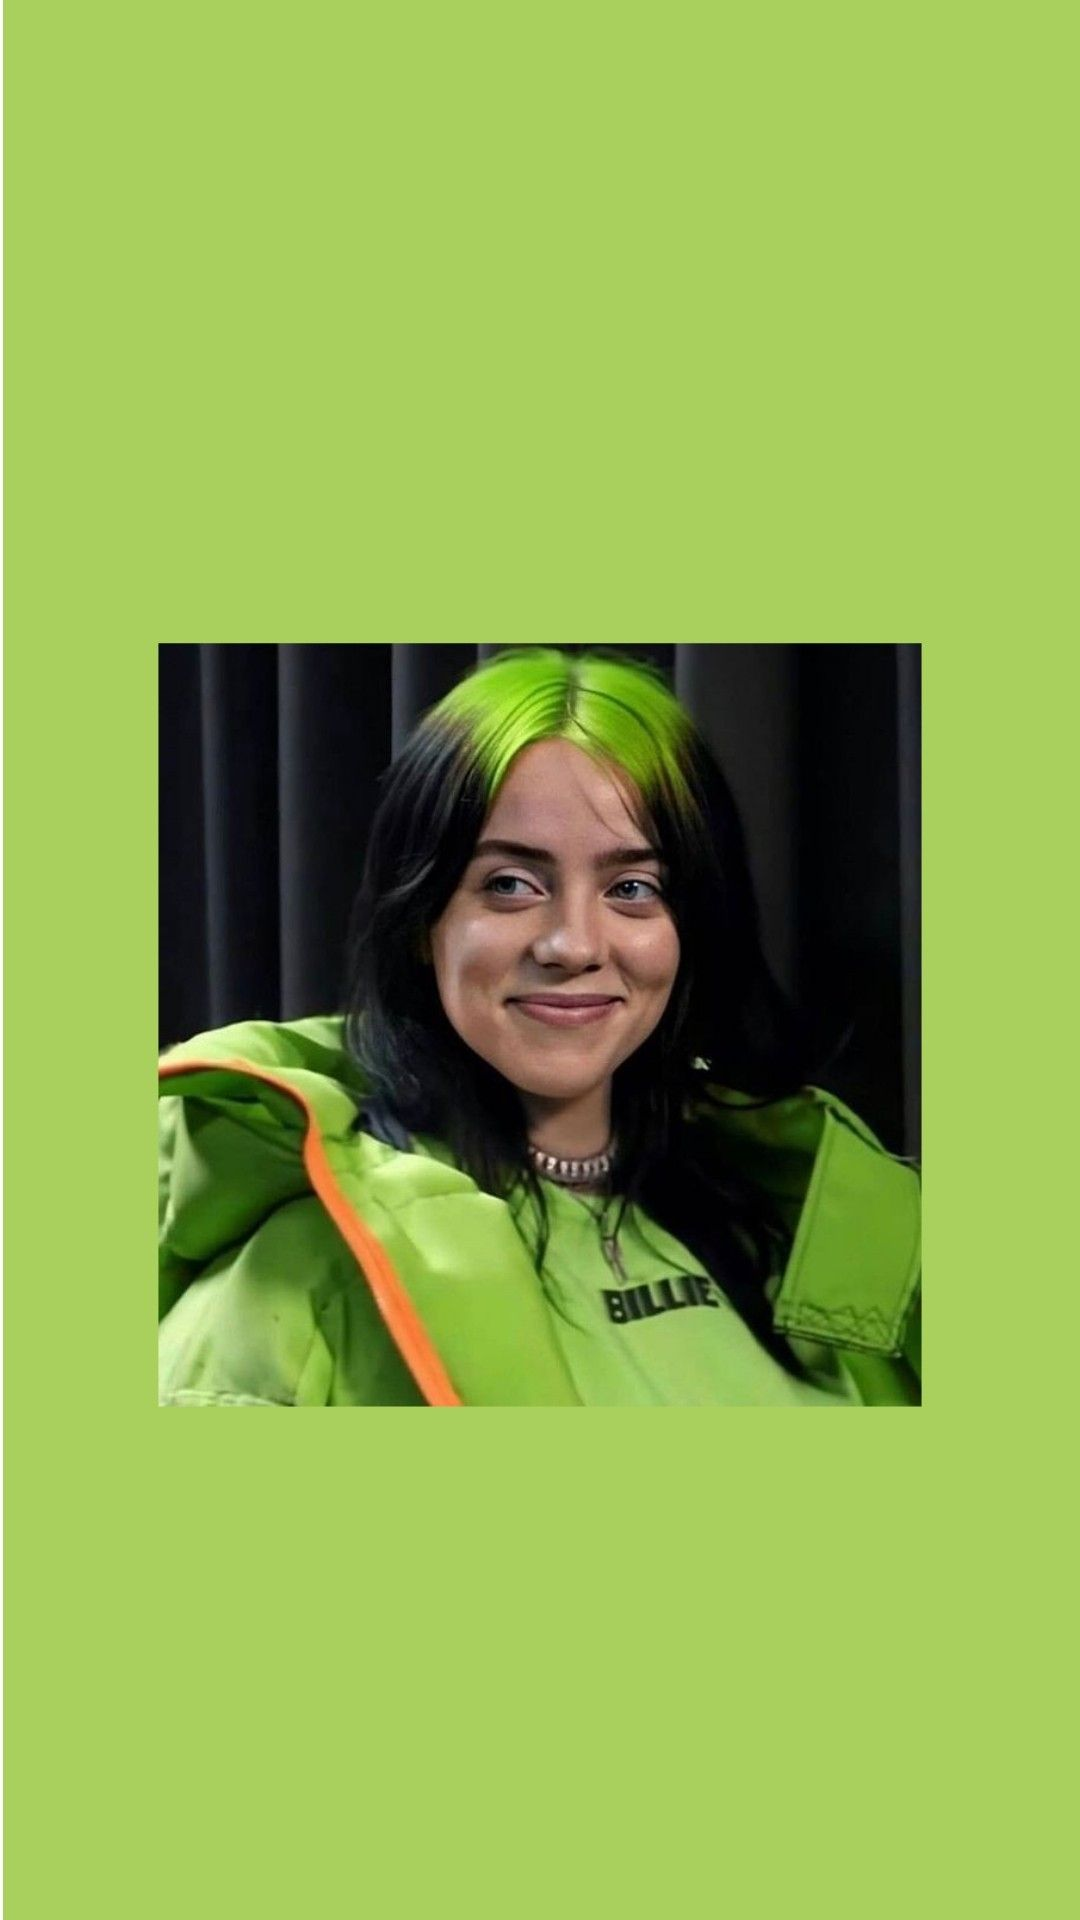 𝘣𝘪𝘭𝘭𝘪𝘦 𝘦𝘪𝘭𝘪𝘴𝘩 𝘸𝘢𝘭𝘭𝘱𝘢𝘱𝘦𝘳 𝘨𝘳𝘦𝘦𝘯 In 2020 Billie Billie Eilish Green Aesthetic